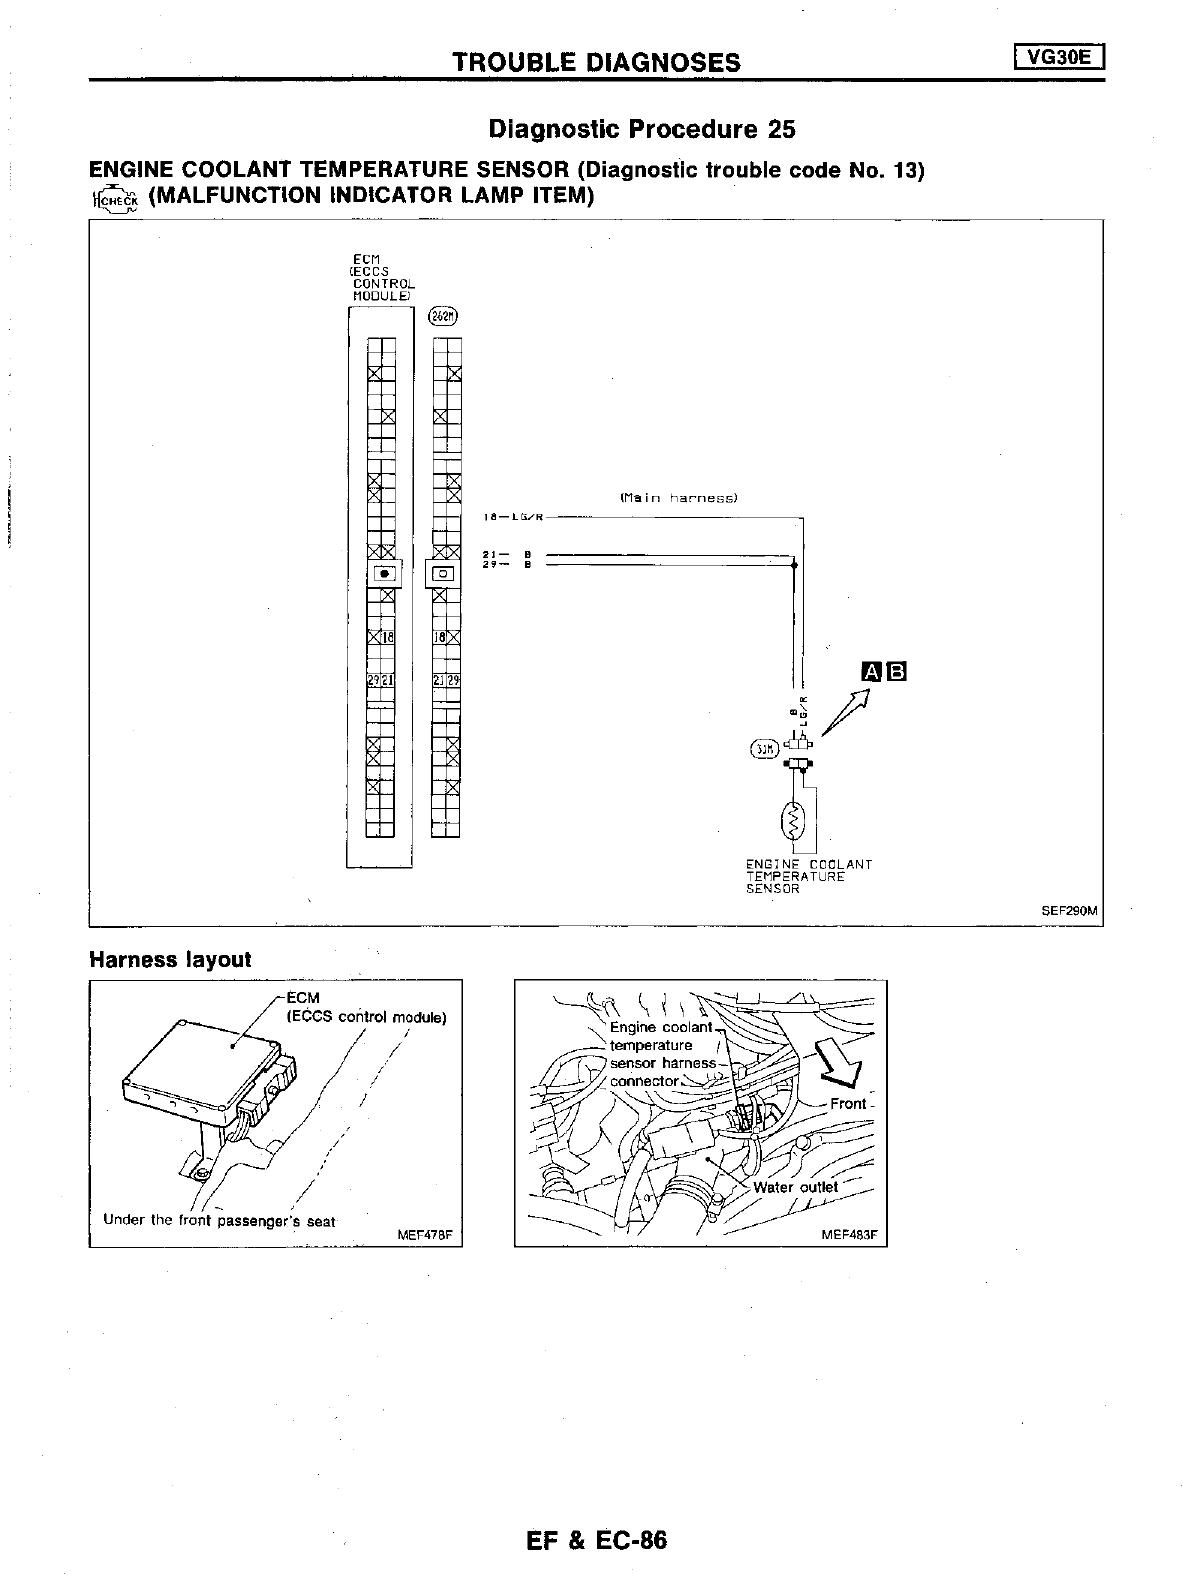 Product Detail Manual Ec on nissan d21 parts diagram, nismo engine diagram, d15b7 engine diagram, sohc engine diagram, l20b engine diagram, 7mgte engine diagram, 2003 nissan xterra power steering diagram, ge90 engine diagram, rolls-royce merlin engine diagram, 351m engine diagram, rb26dett engine diagram, 1995 nissan pathfinder engine diagram, engine engine diagram, 2001 nissan maxima engine wiring diagram, vq35de engine diagram, ka24de engine diagram, integra engine diagram, nissan d21 exhaust system diagram, nissan 3.0 engine diagram, 1995 nissan pathfinder exhaust system diagram,